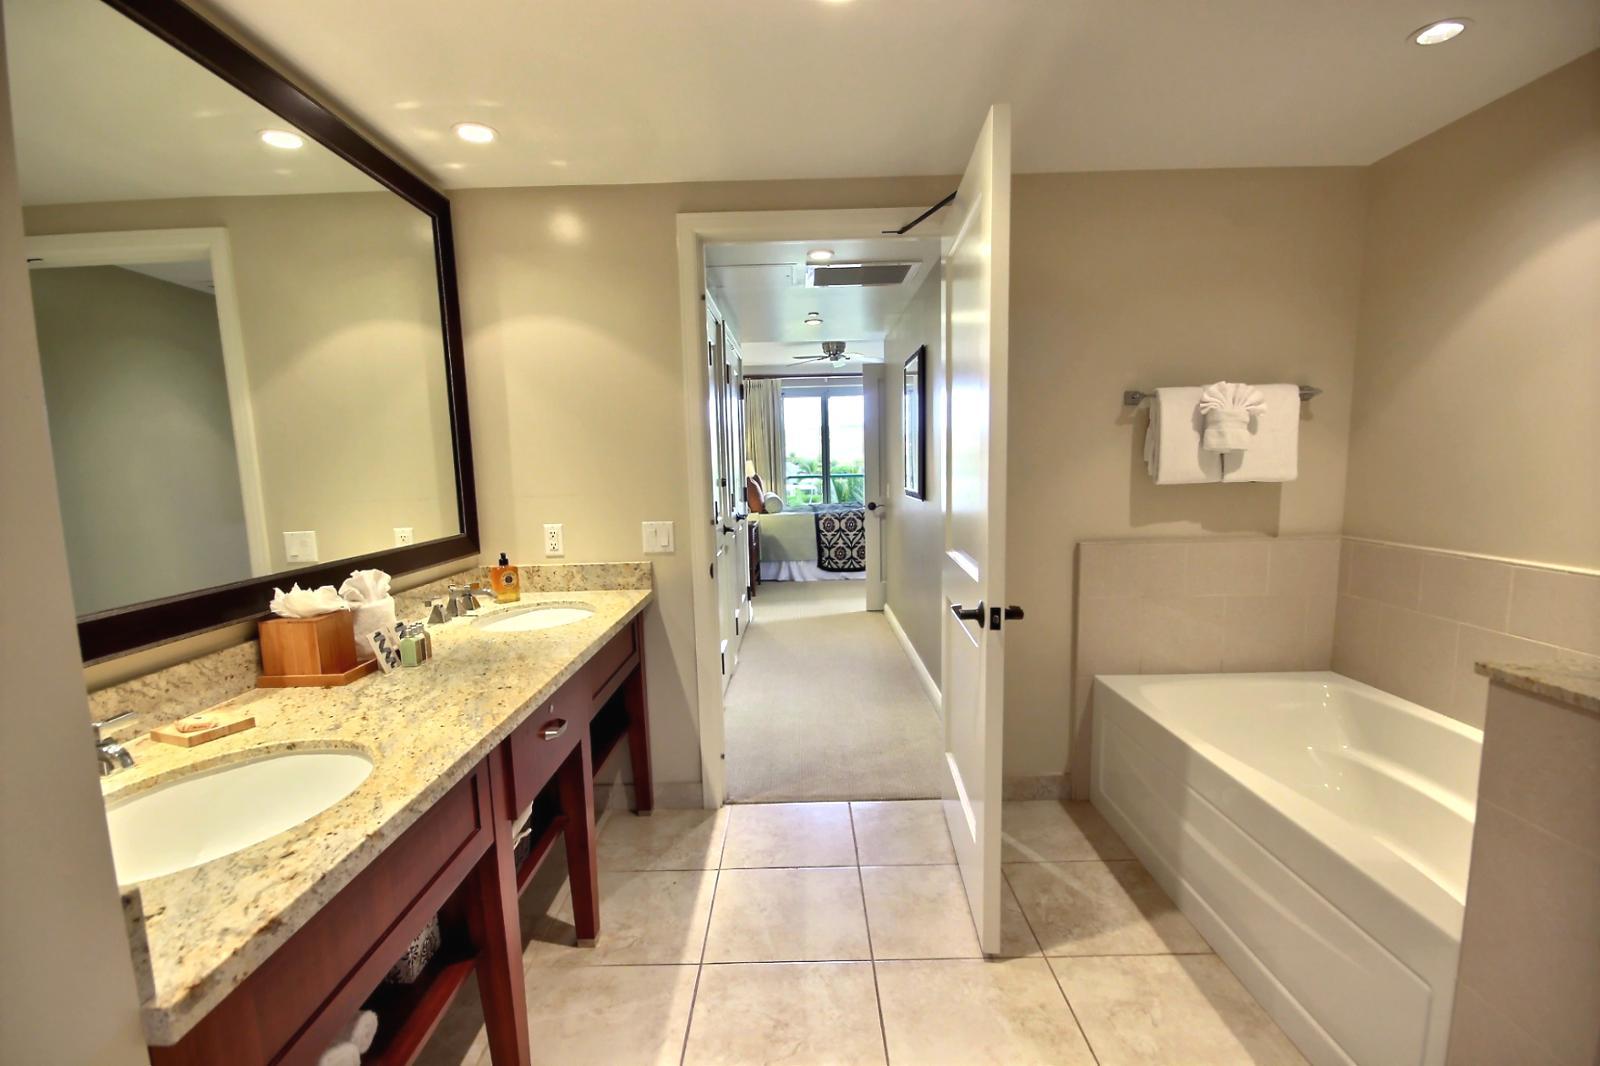 Bathroom Mirrors Hawaii kbm hawaii - honua kai #hkk-420 - luxury vacation rental at